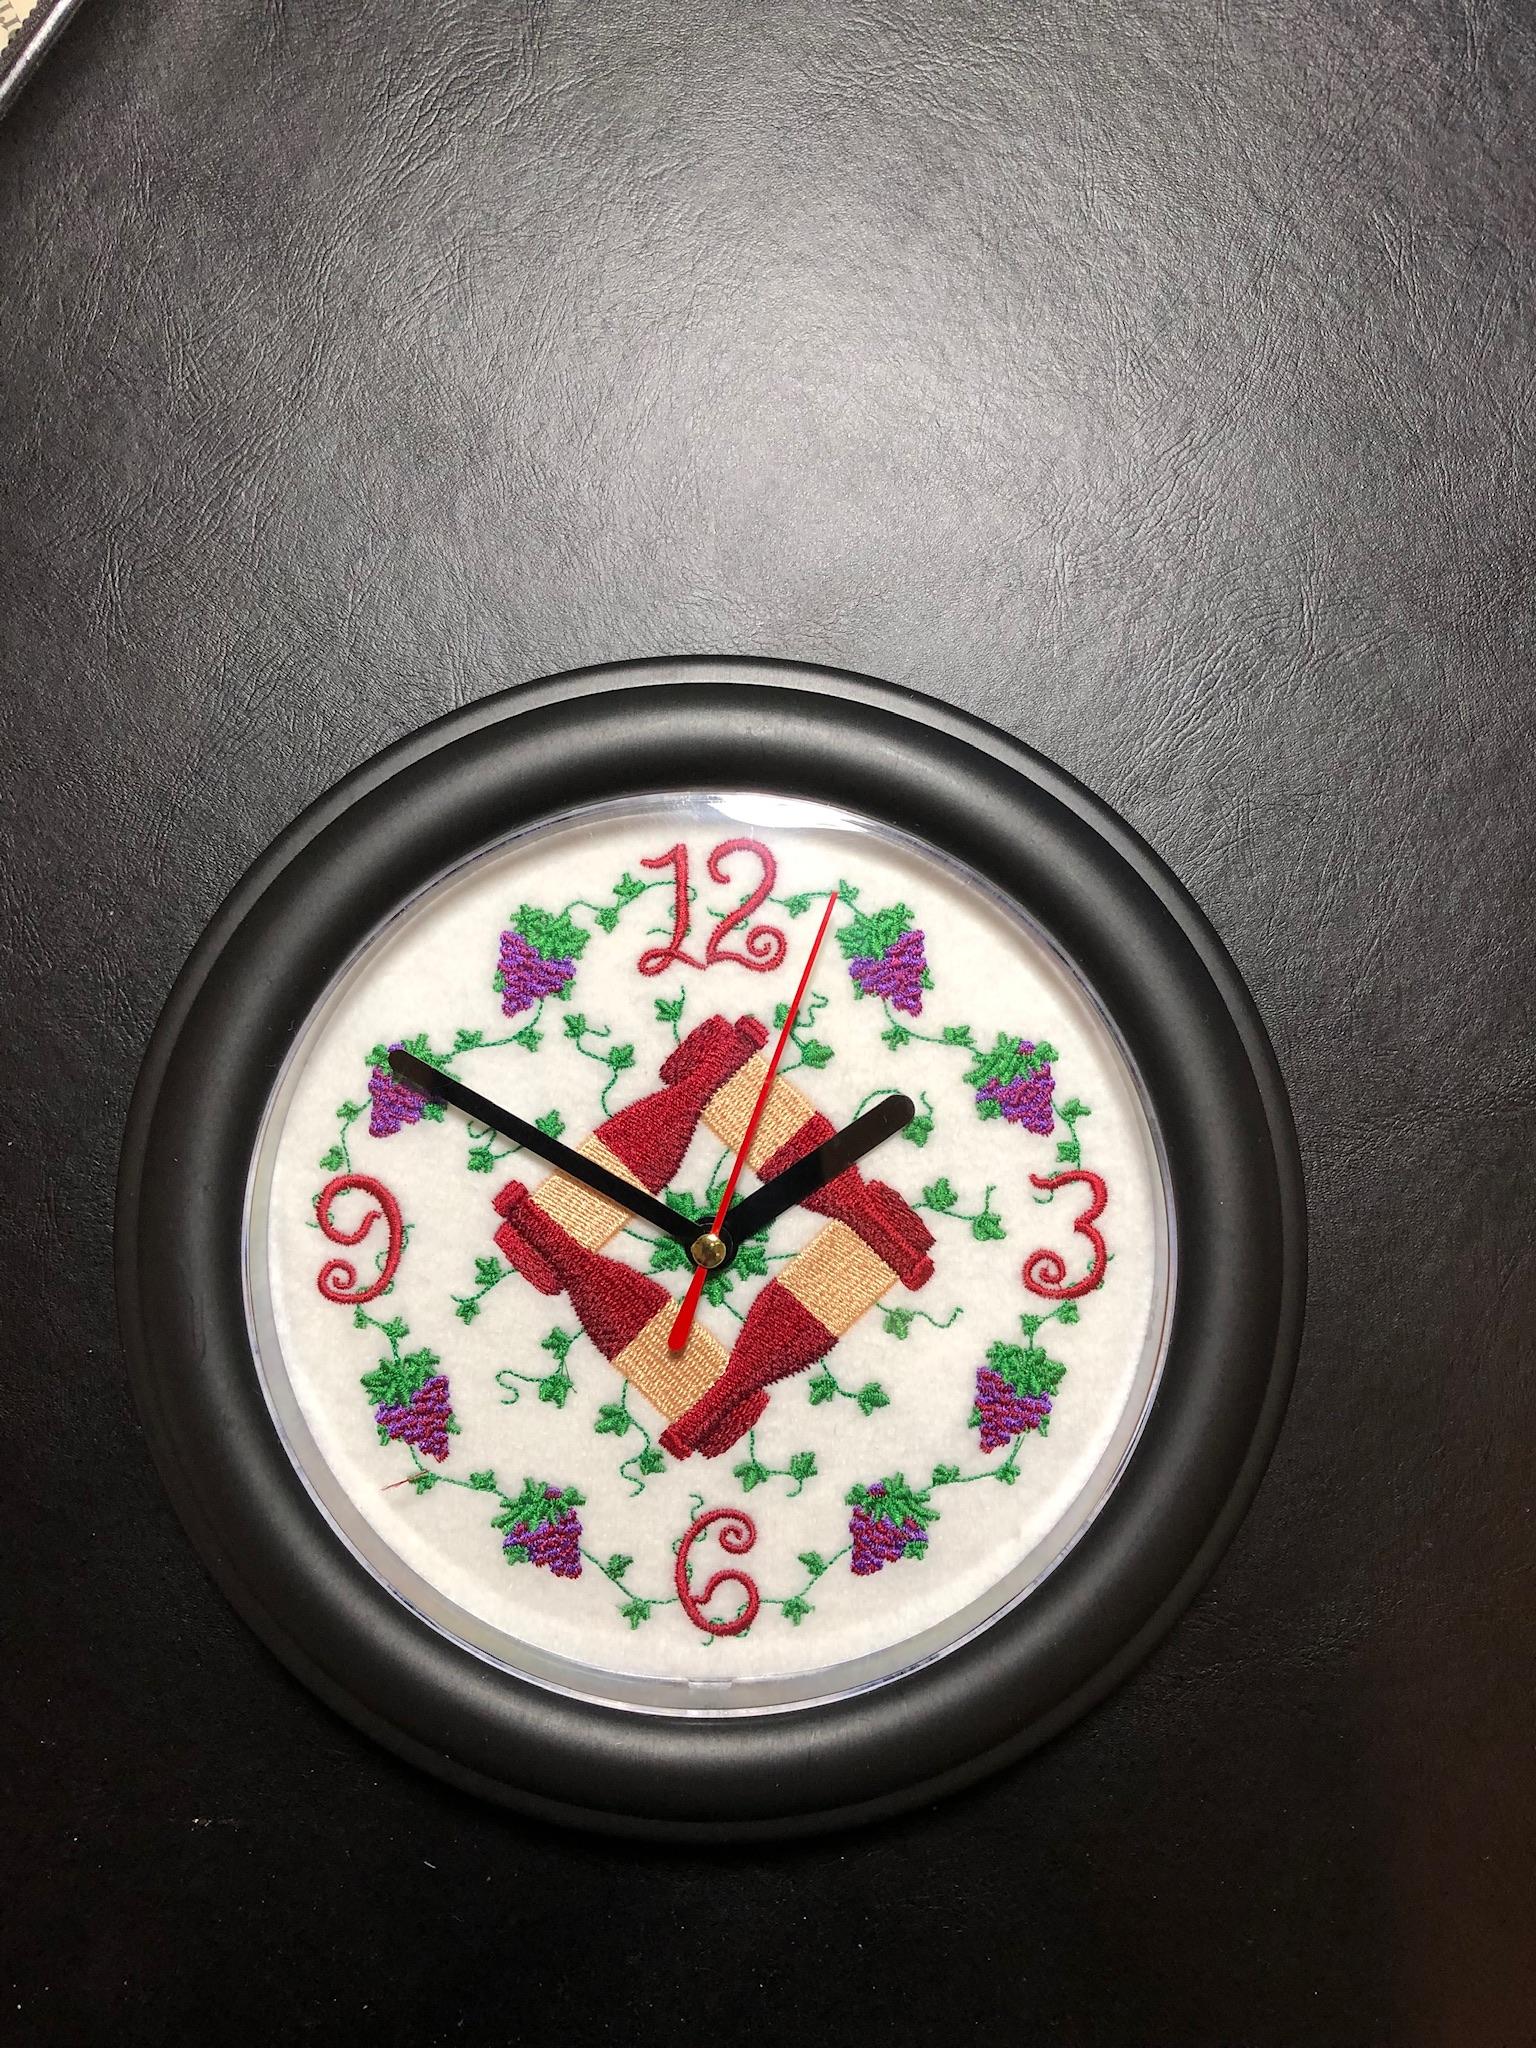 Embroidery/2EE9A79E-EBC1-4977-A47B-C55EAB48BCB1.jpeg